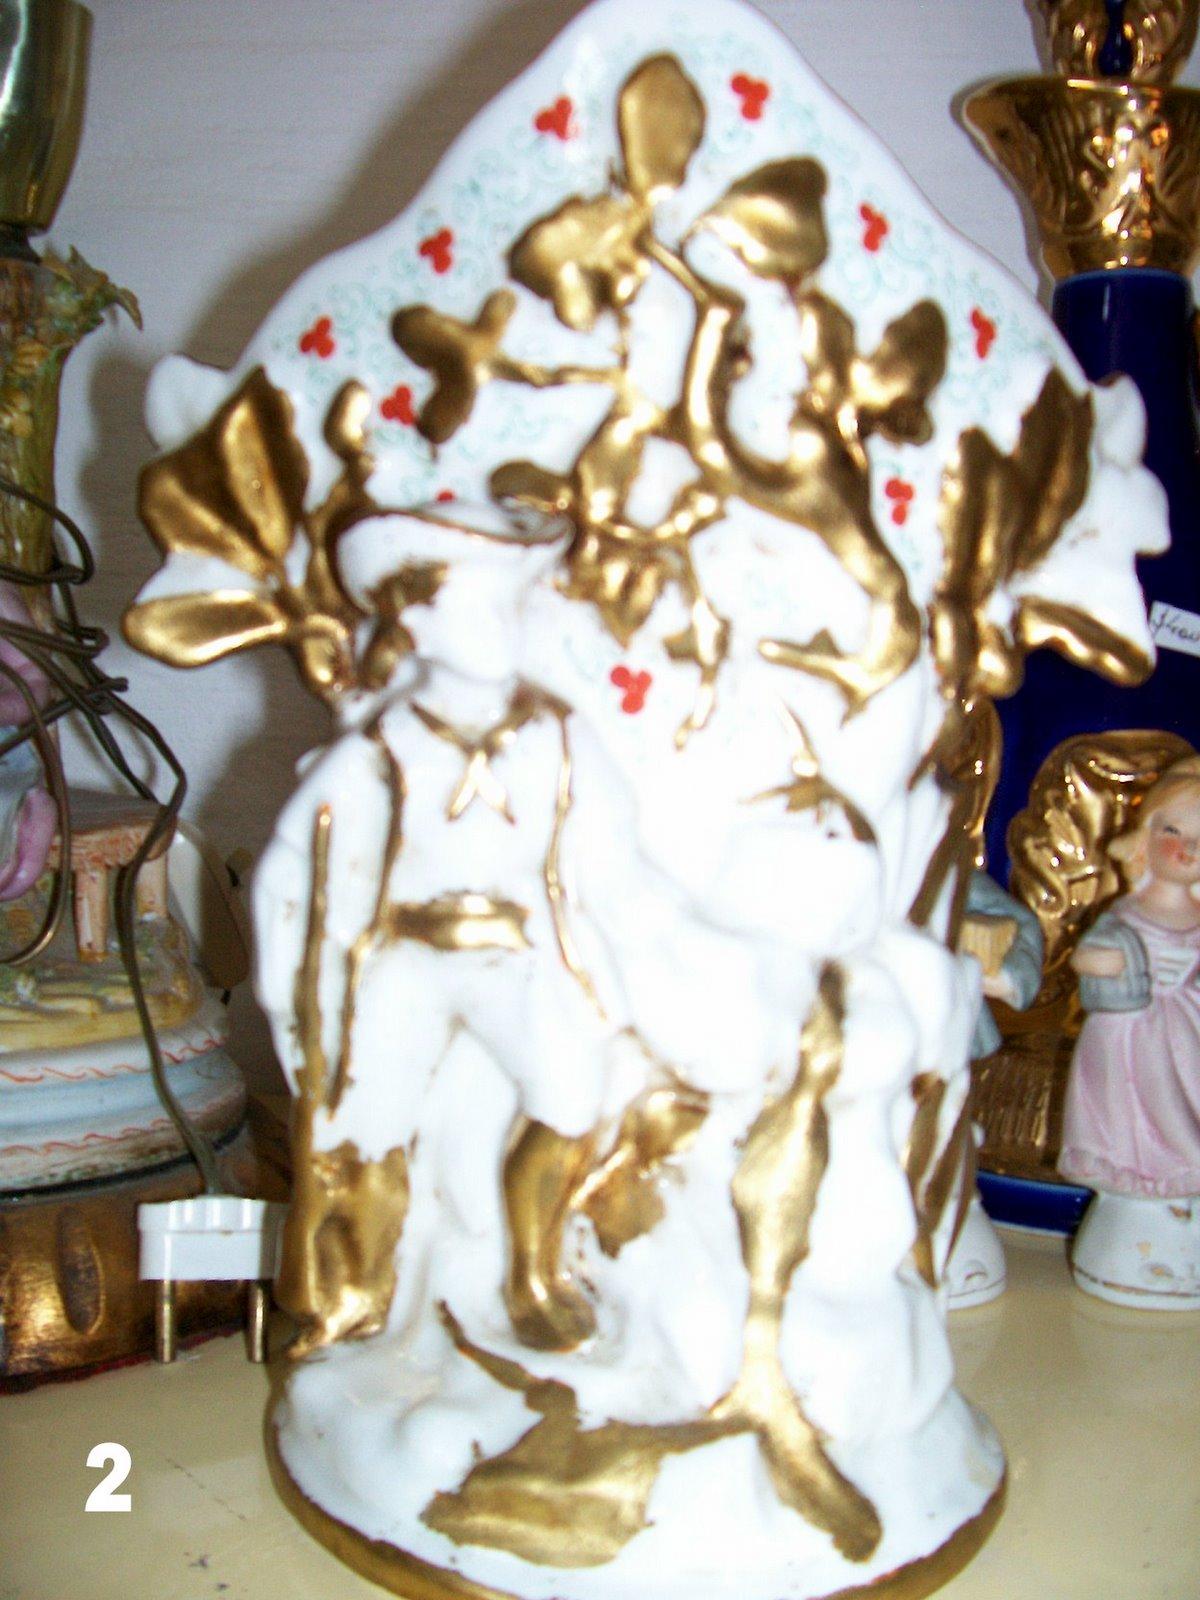 Antiguedades en cordoba argentina porcelanas - Muebles antiguos cordoba ...